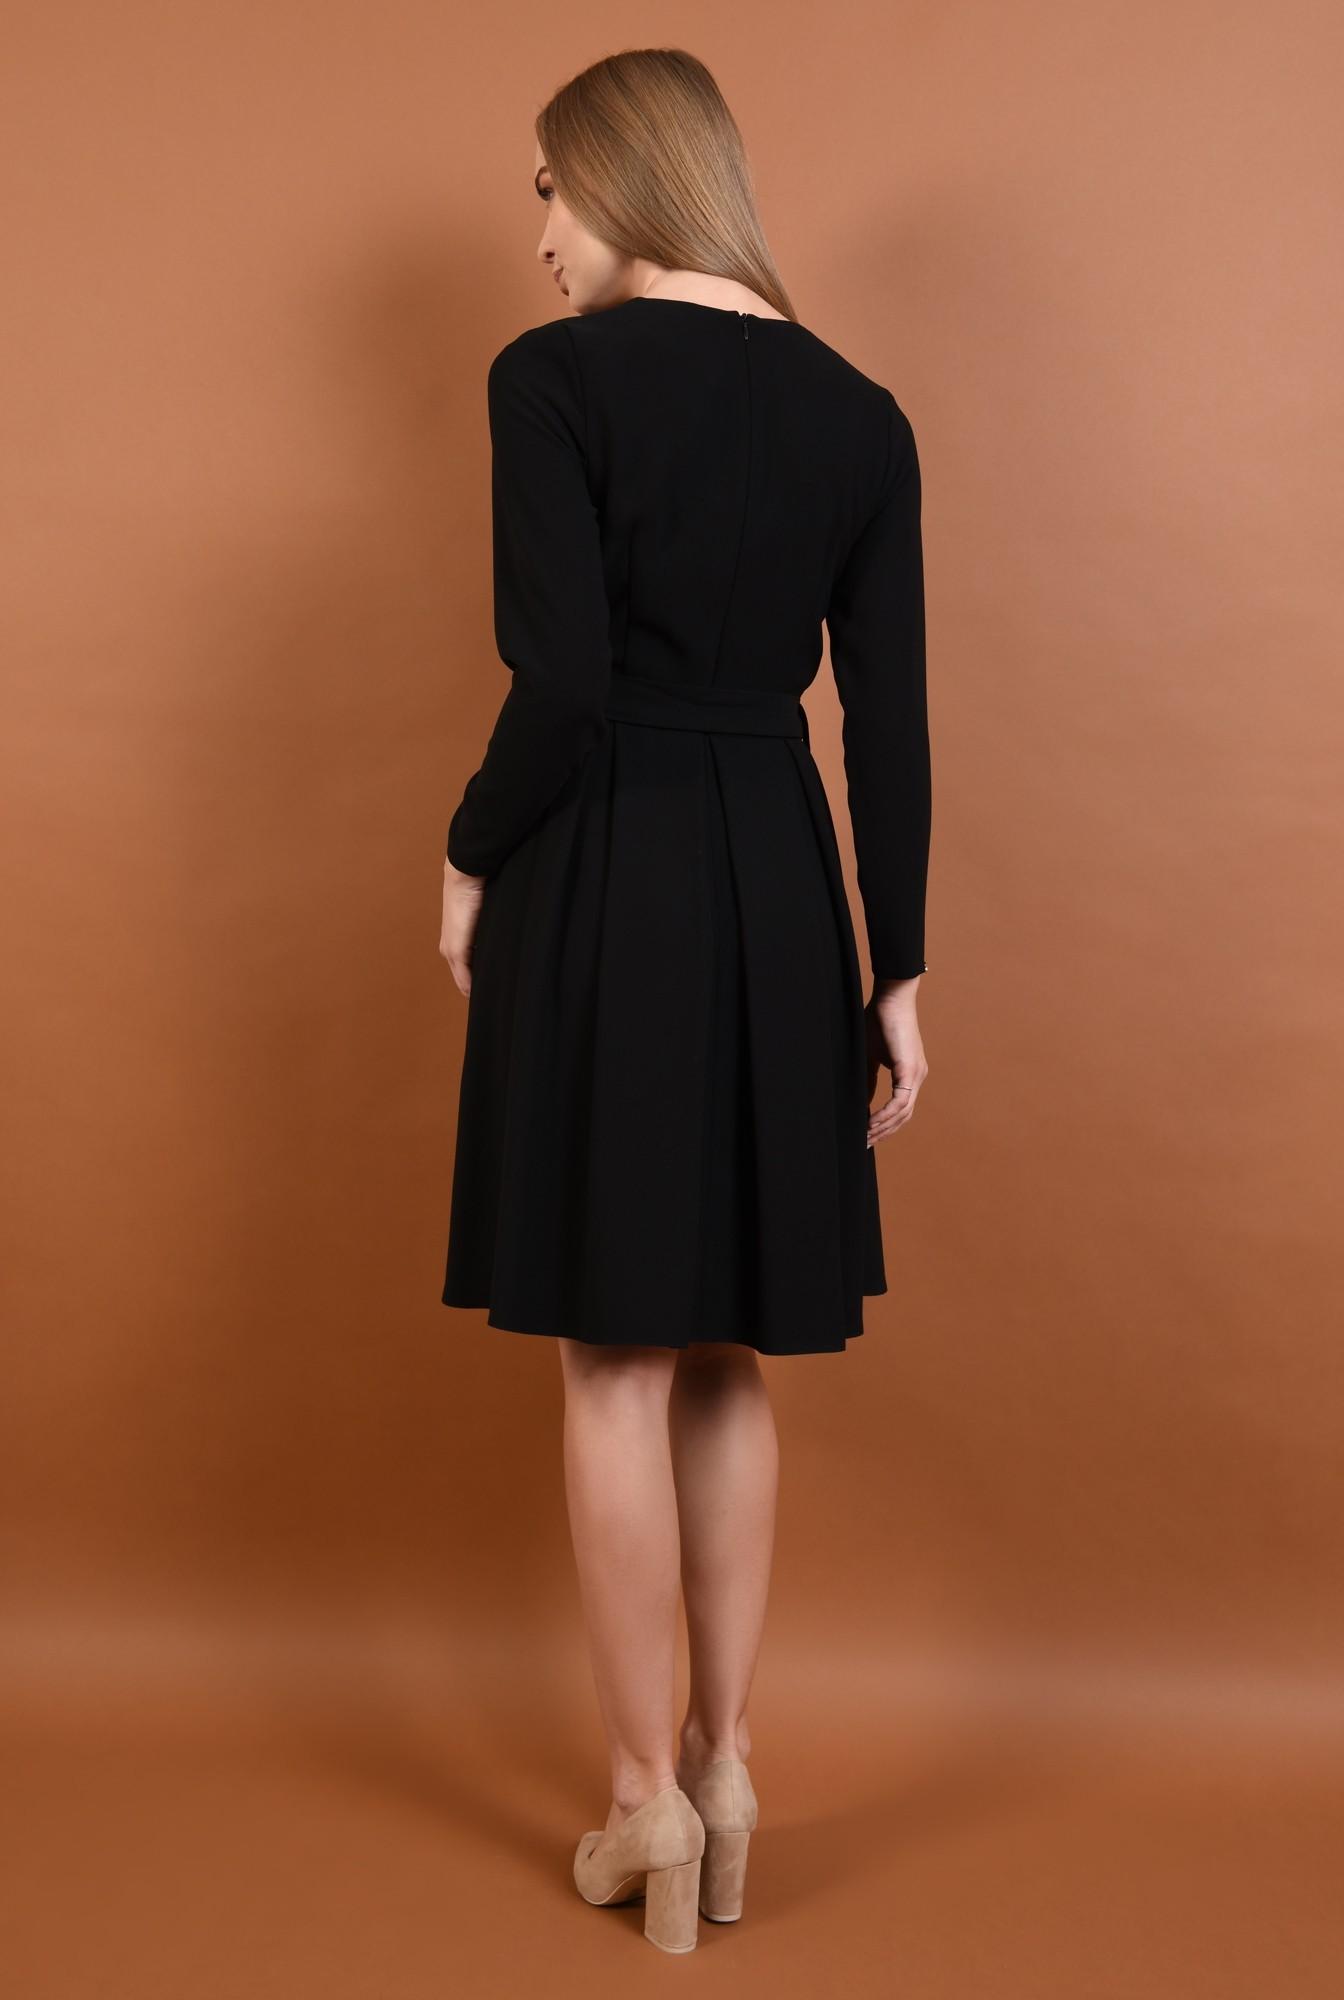 1 - 360 - rochie casual evazata, pliseuri late, cordon, funda, negru